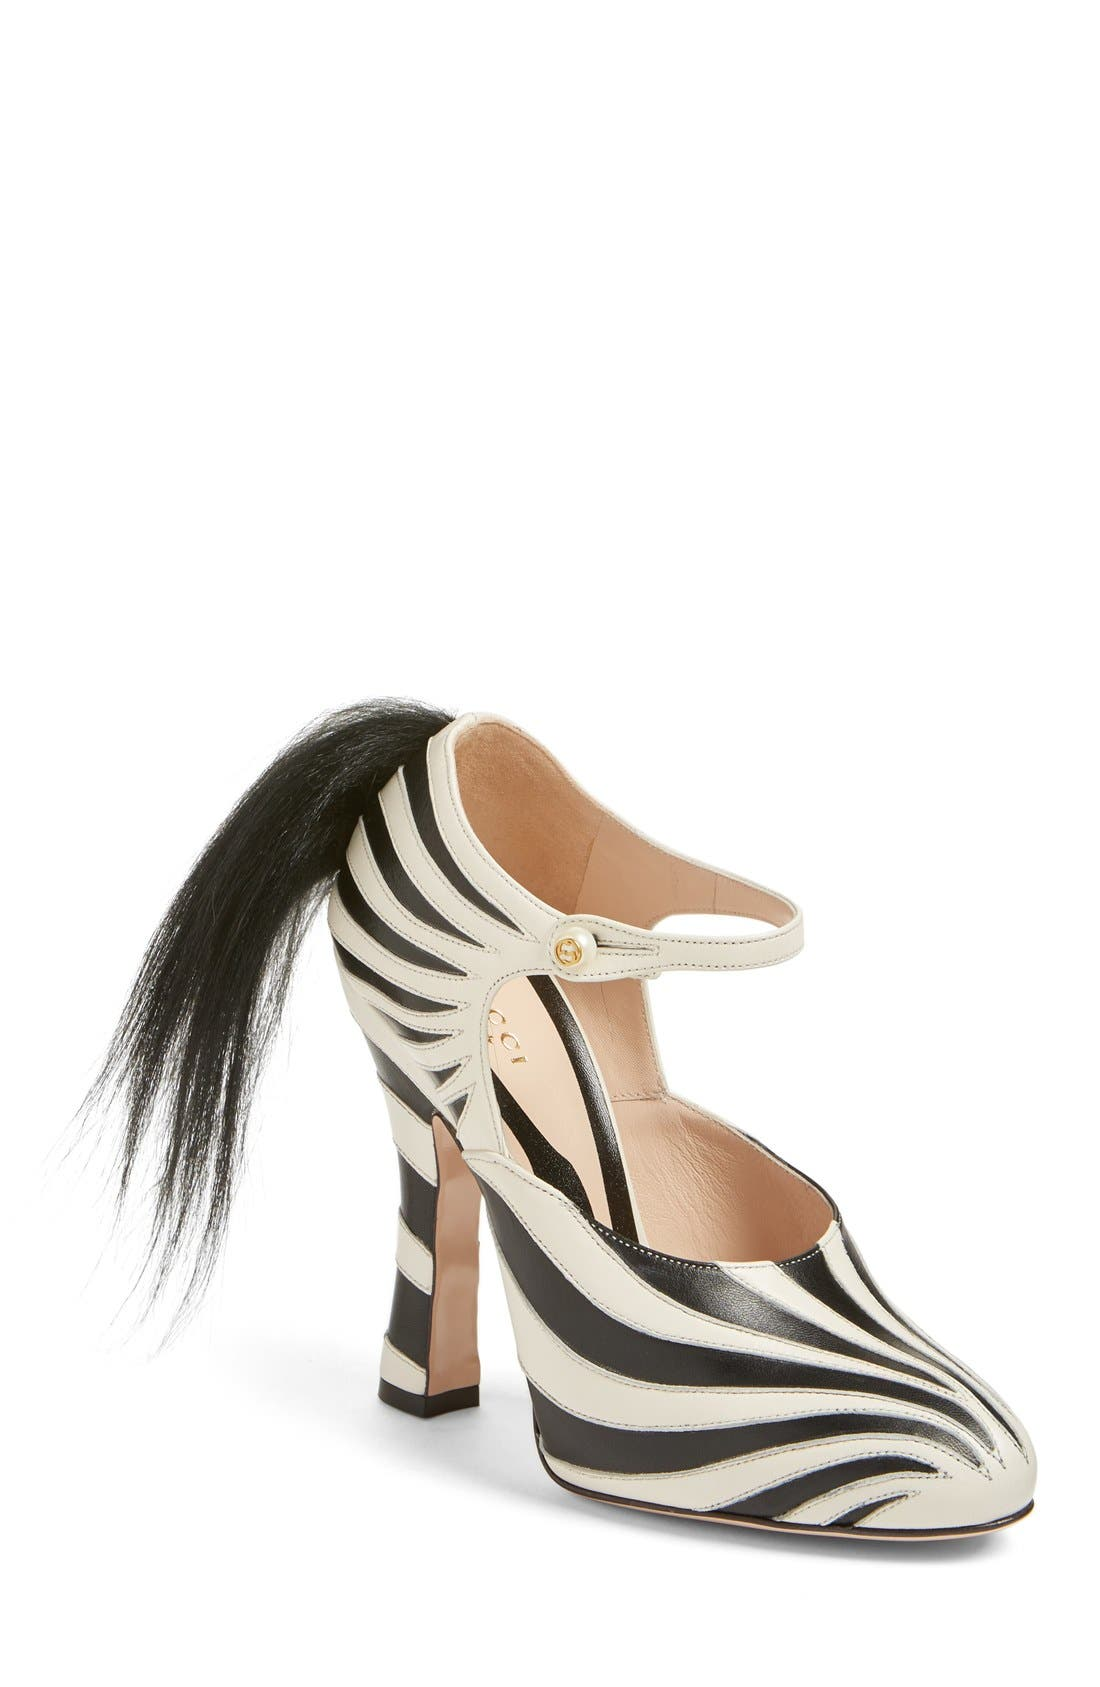 'Lesley' Zebra Stripe Pump,                         Main,                         color, 124